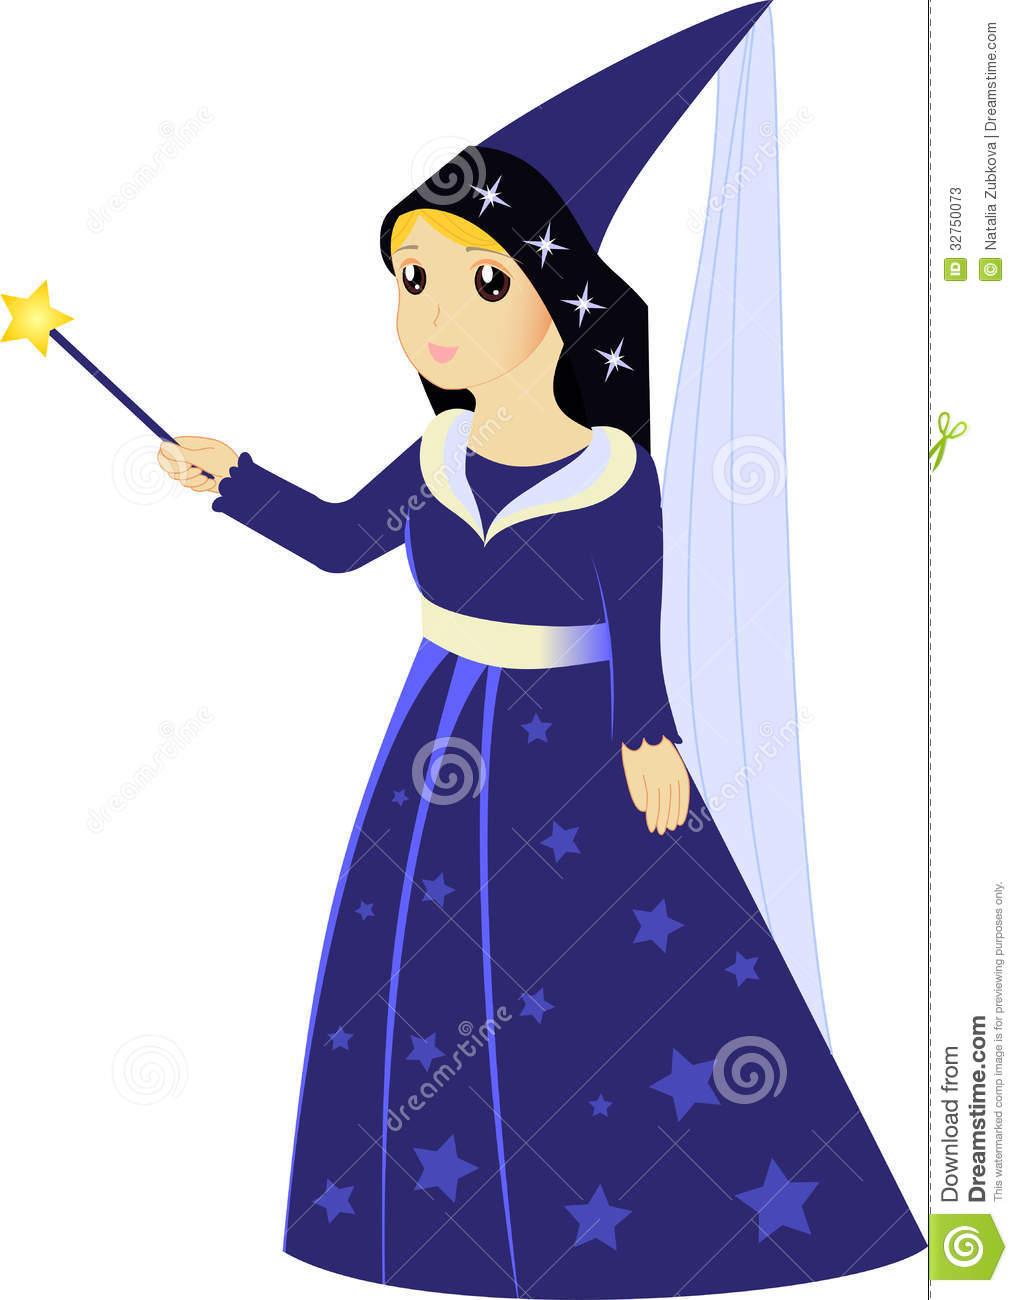 Cartoon Fairy Sorceress With Magic Wand Stock Photos.